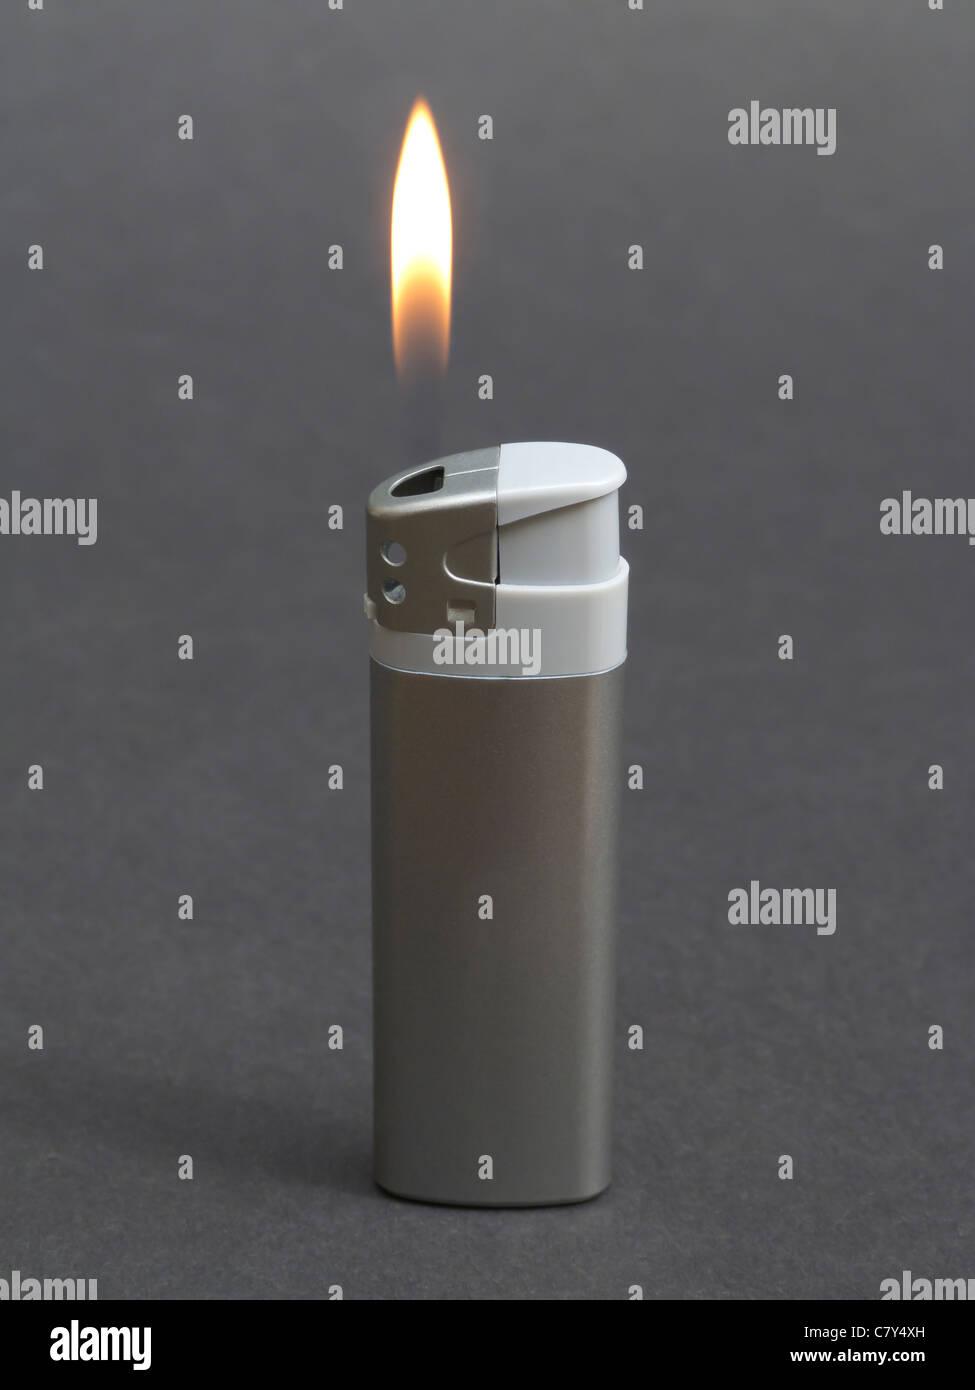 Lit Silver Lighter - Stock Image